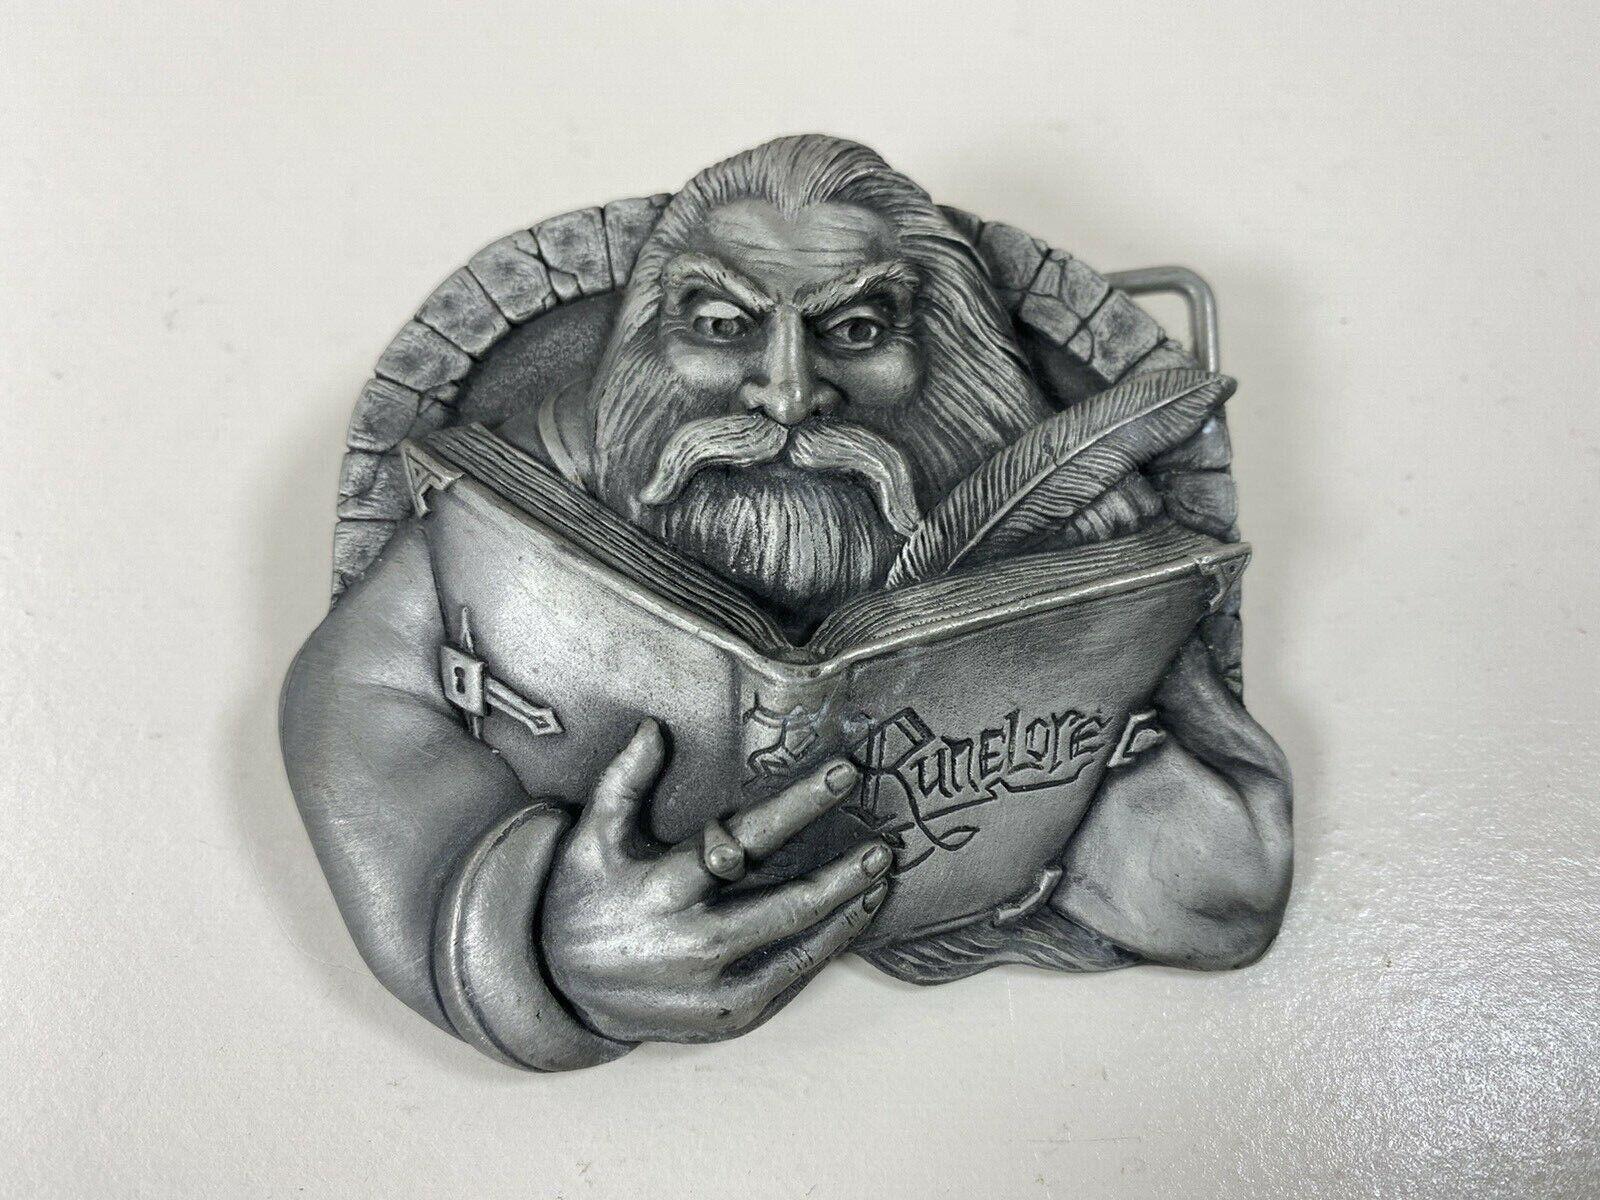 Runelore Belt Buckle Runes Cosplay Fantasy Themed Fandom - The Bulldog Buckle Co